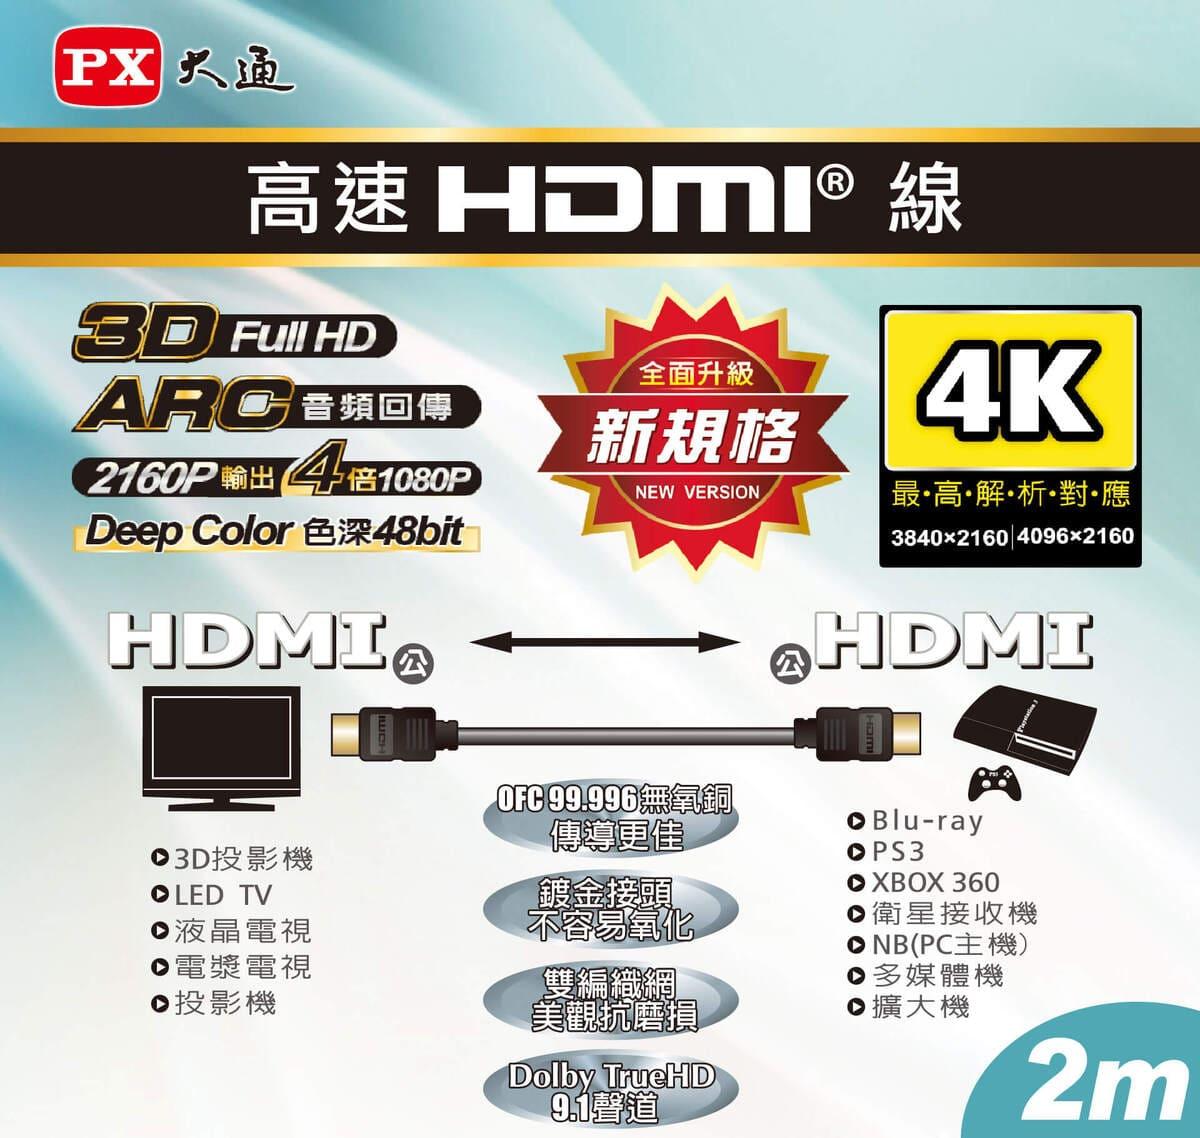 proimages/product/pro-02/pro02-001/HDMI-2MM/HDMI-2MM-3.jpg